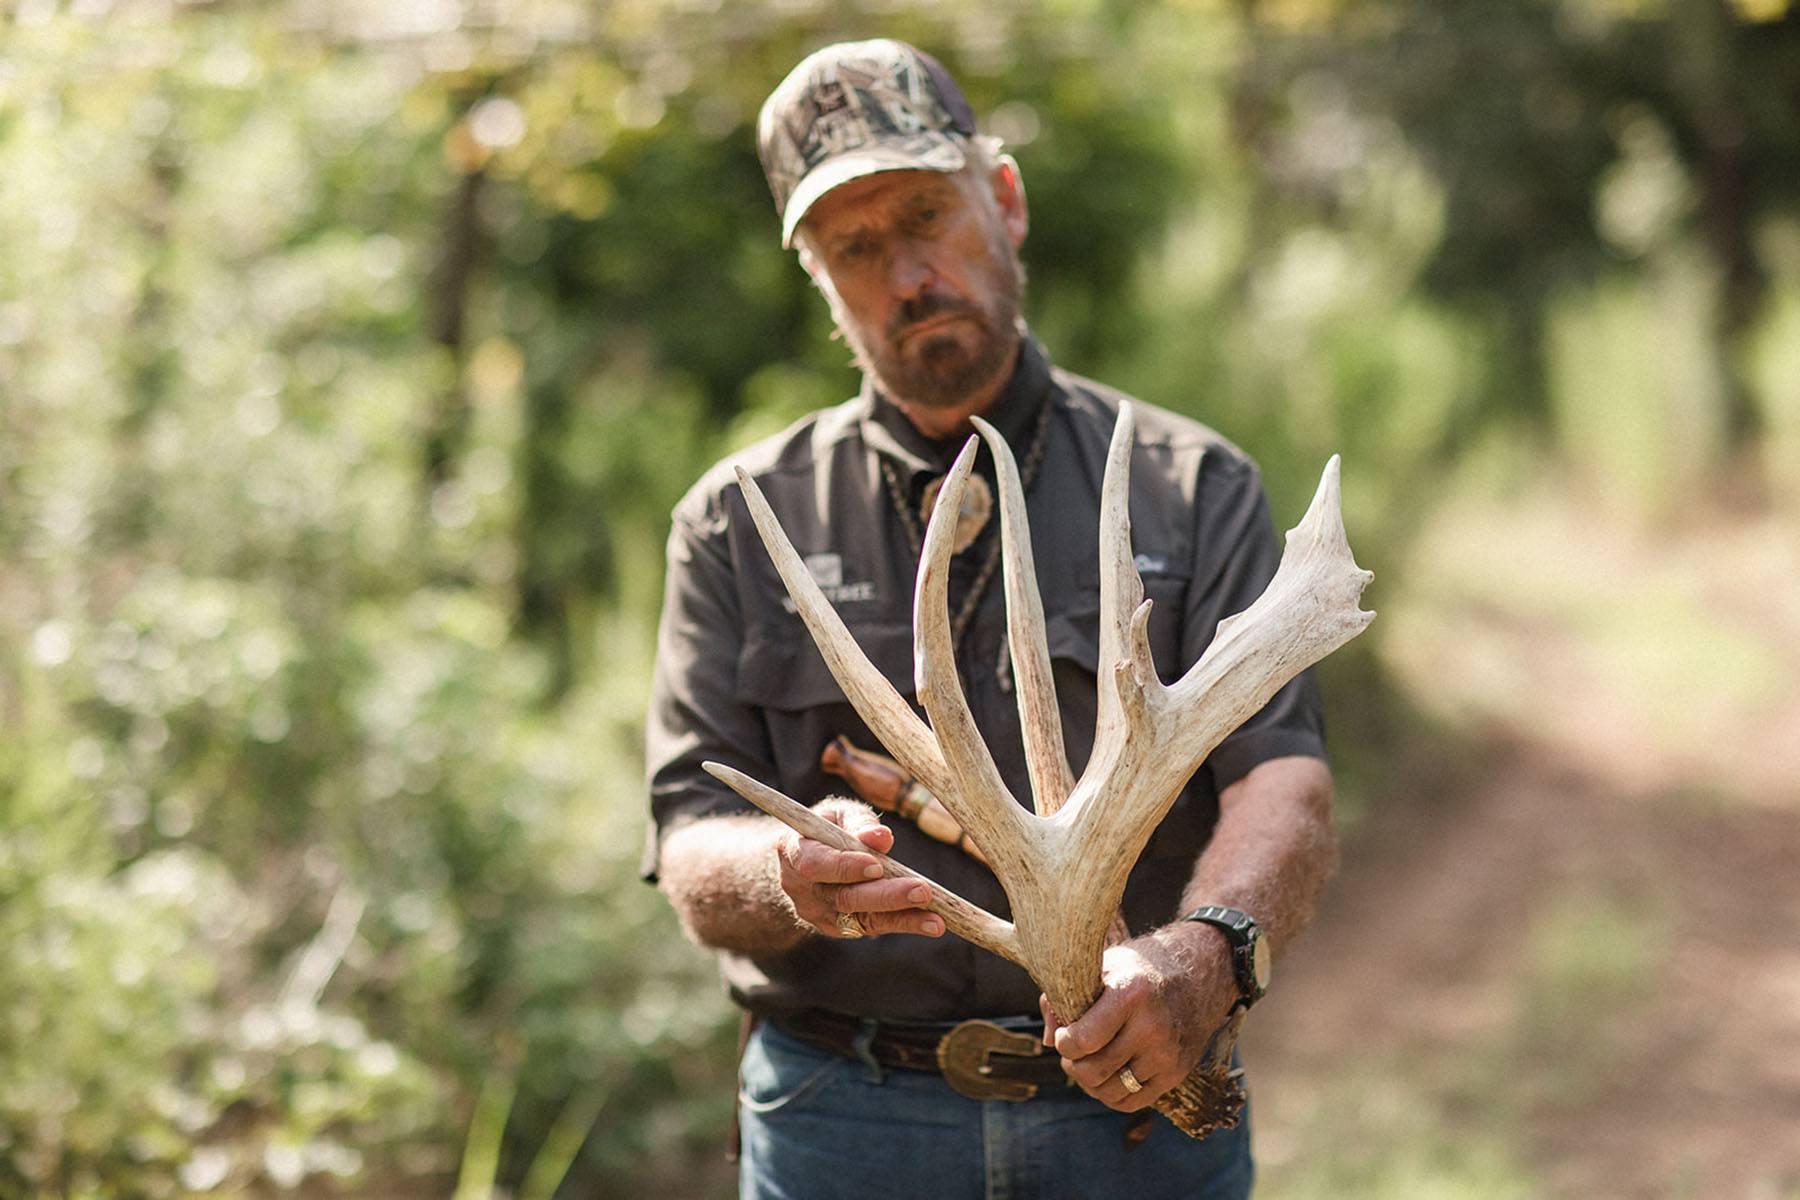 Inspecting antlers for deer health